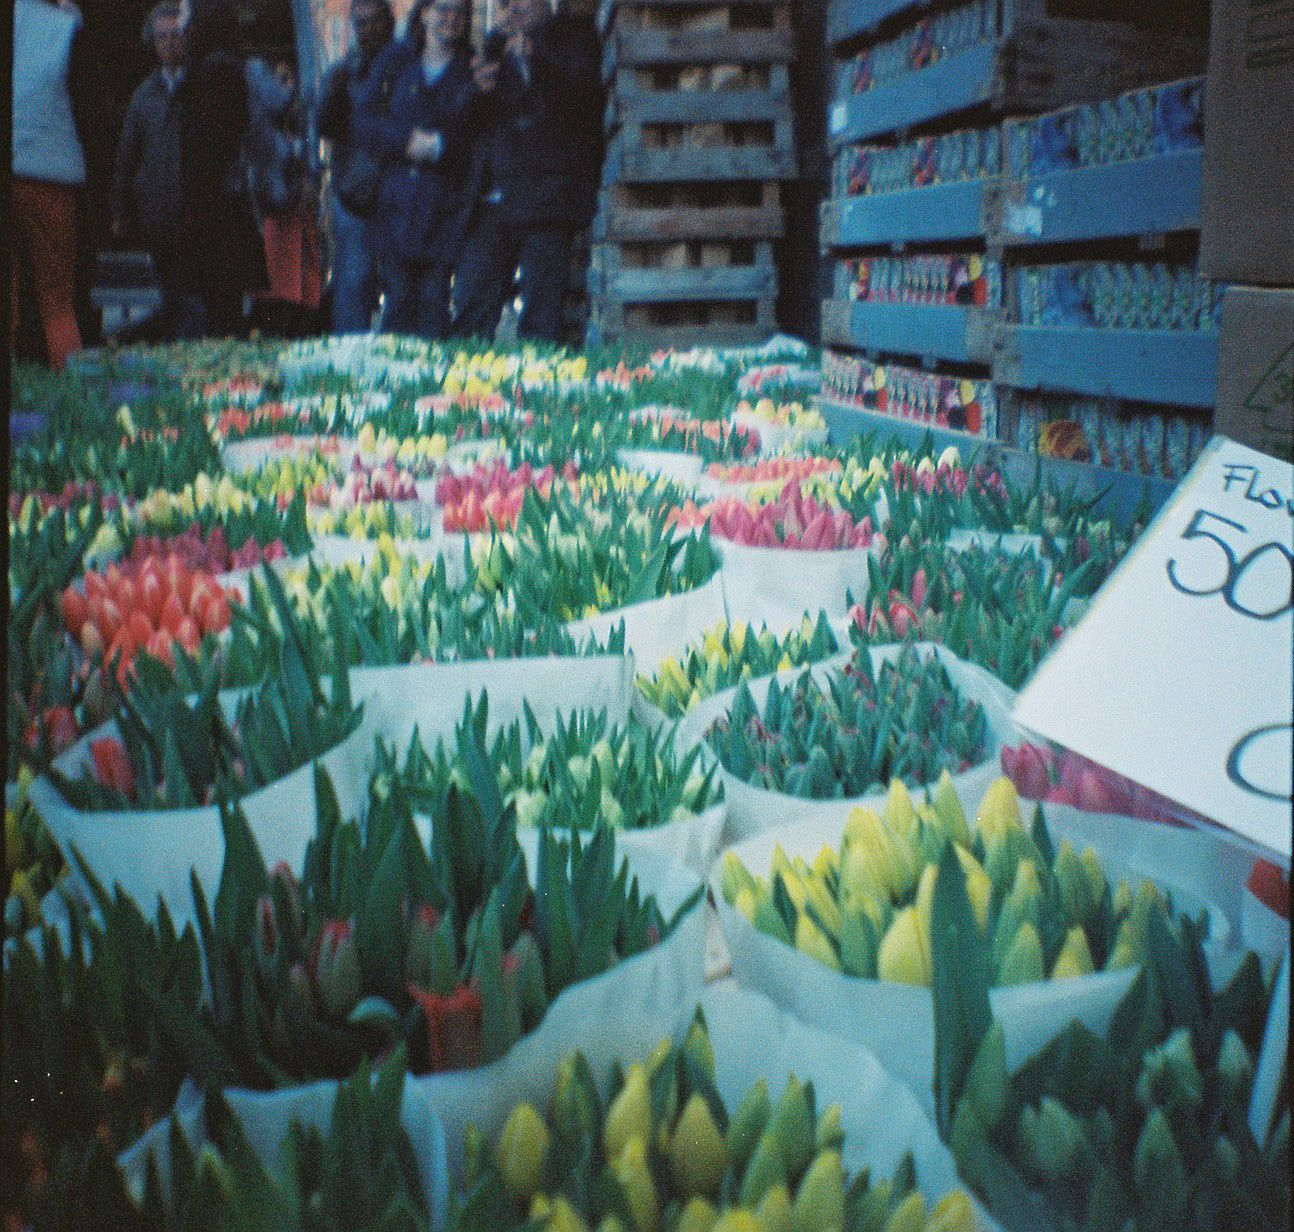 Amsterdam flower market with my diana mini